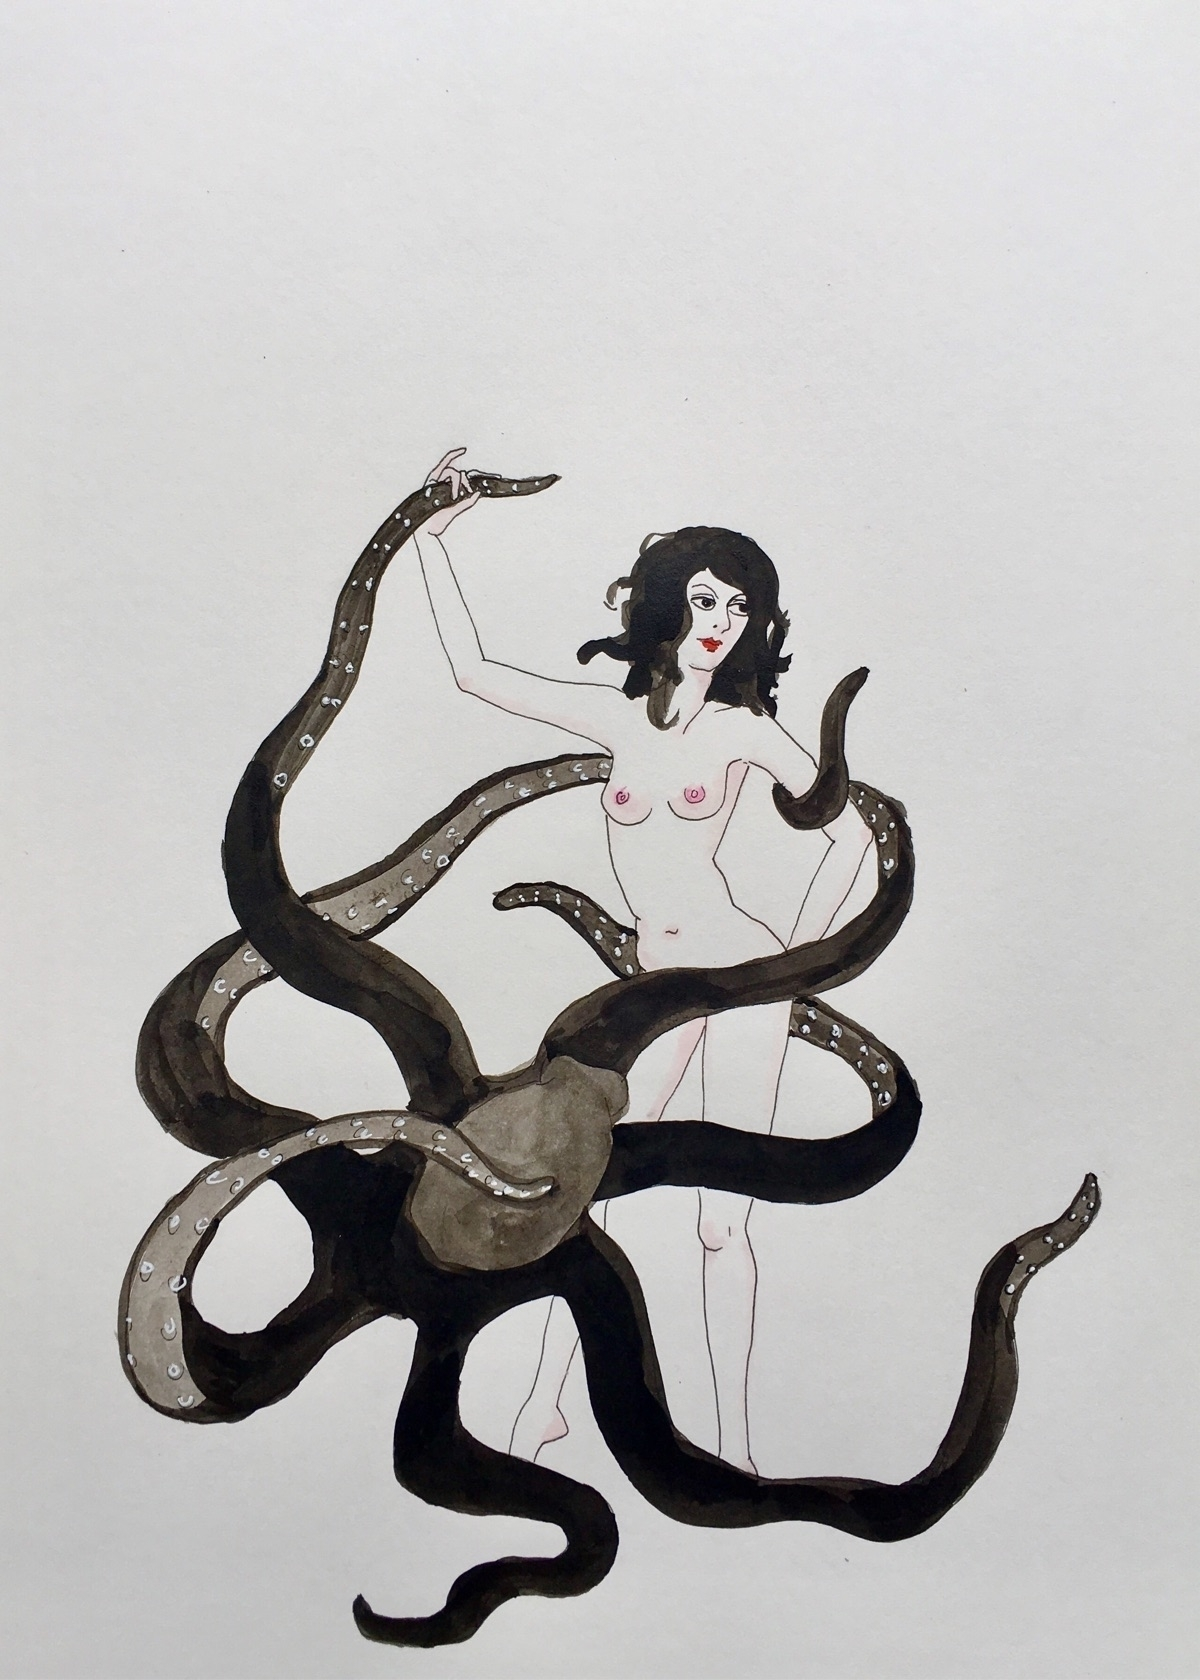 dancing octopus - kunst, drawing - lorettamae | ello